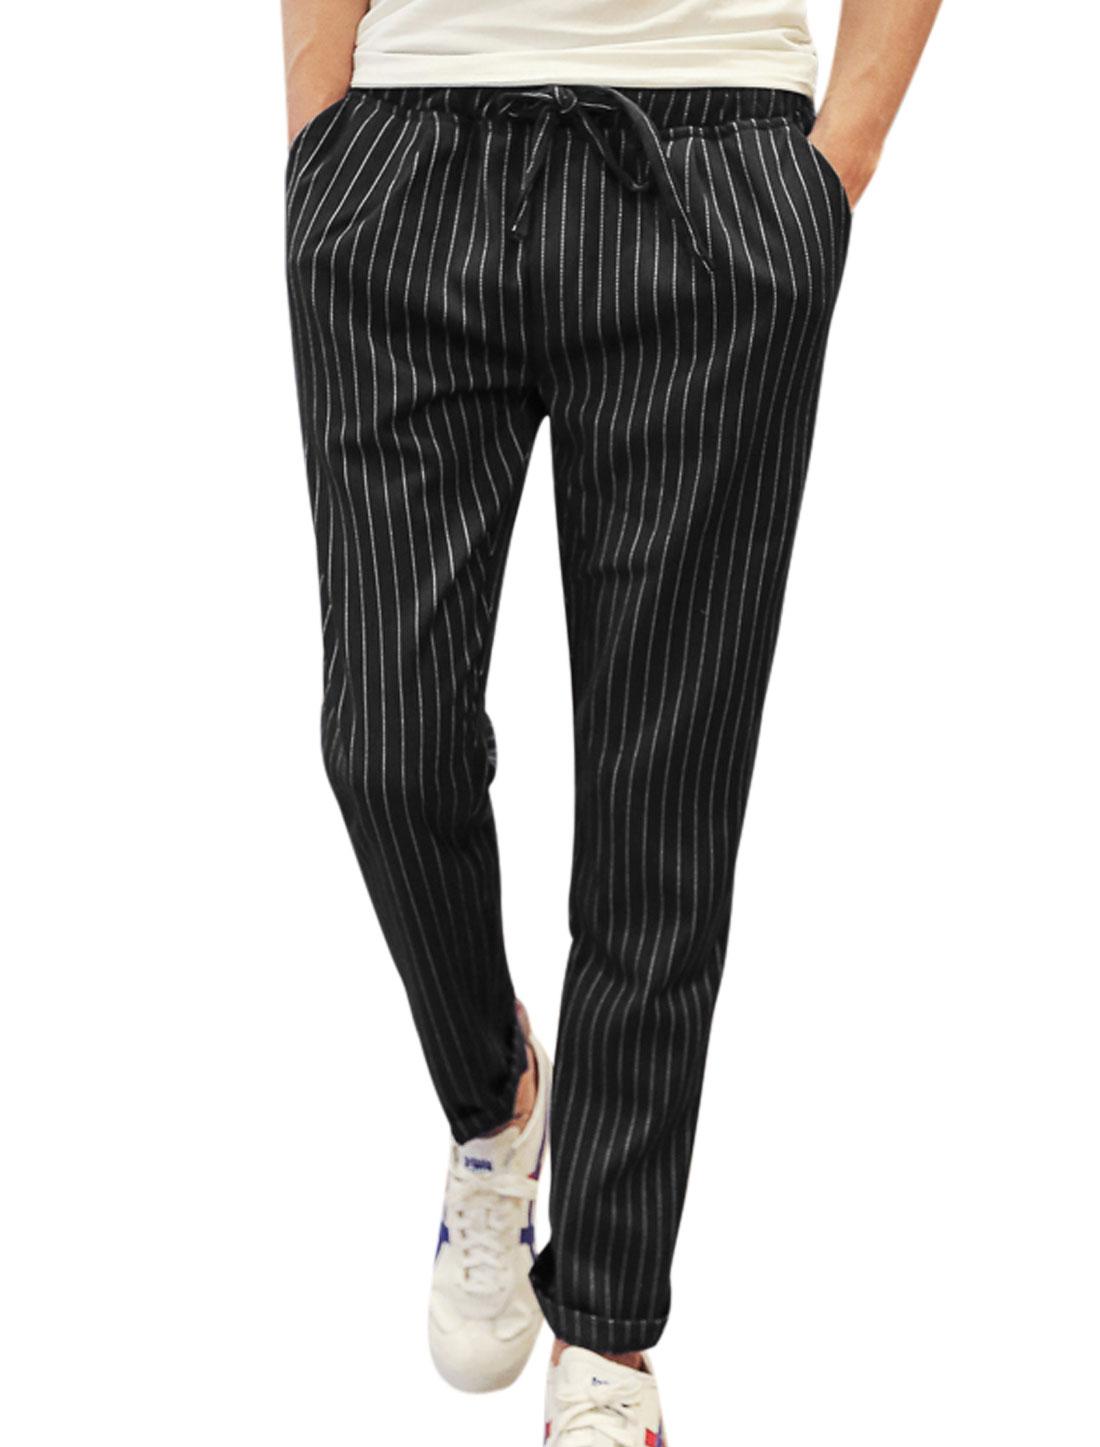 Men Mid Rise Drawstring Waist Stripes Print Pockets Cropped Pants Black W30